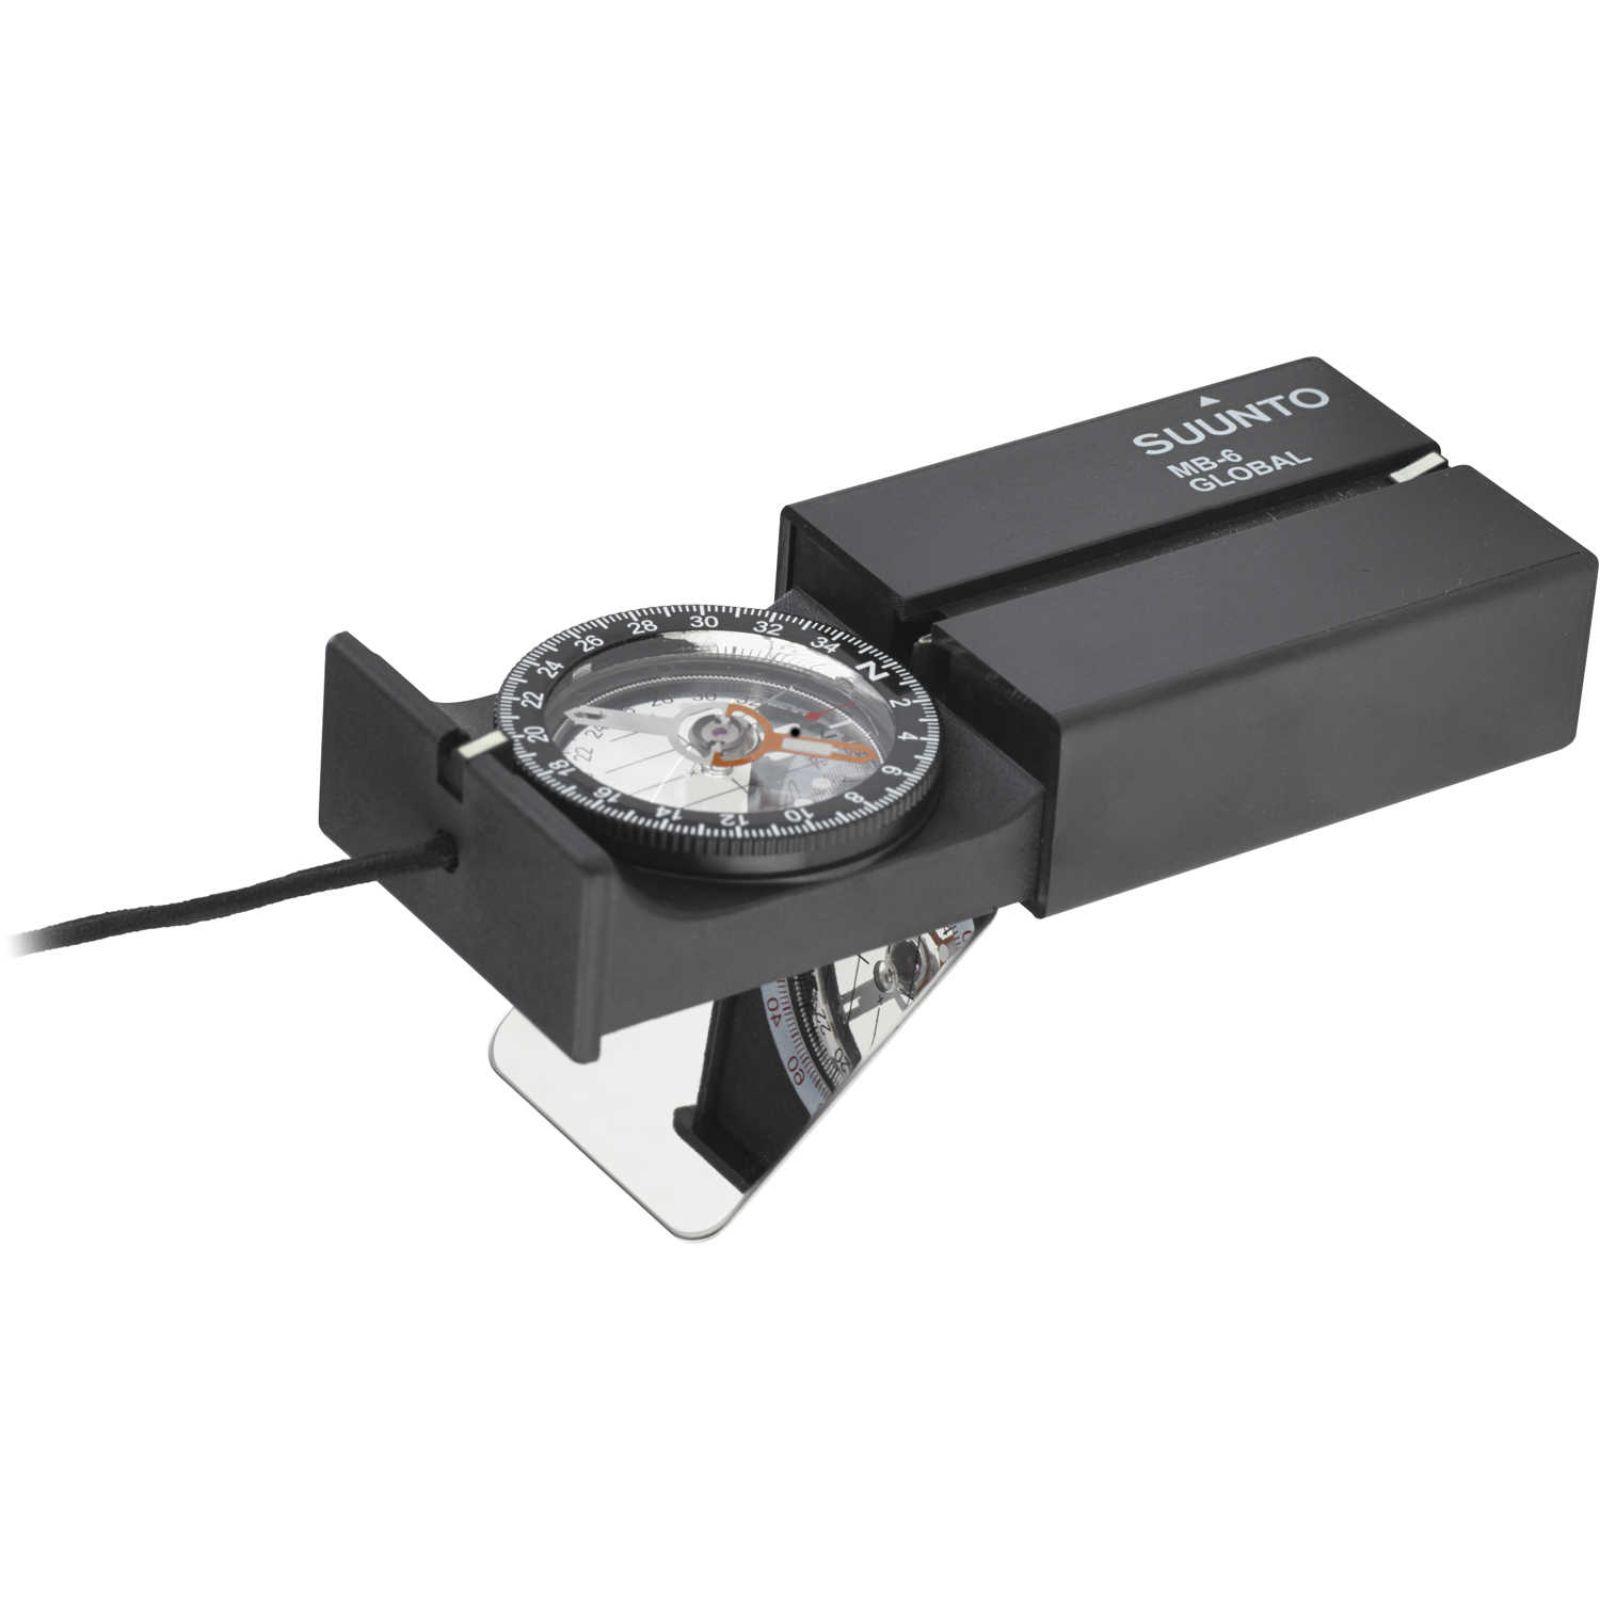 Suunto MB-6 Global Compass